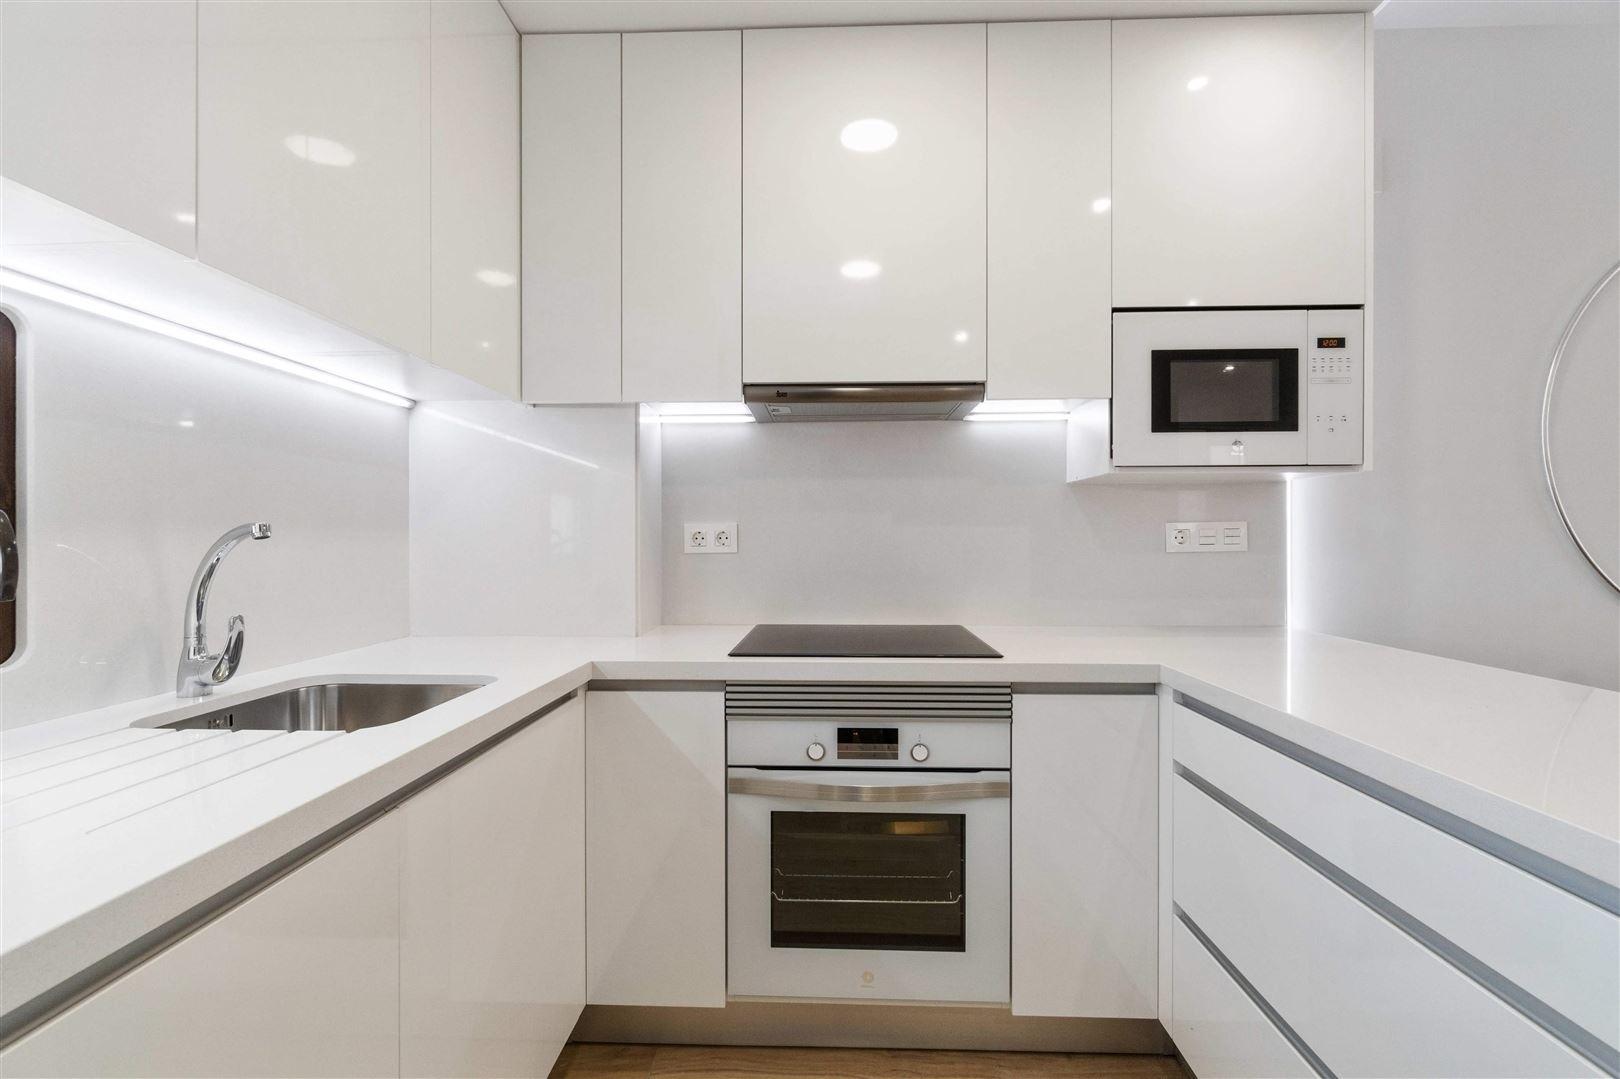 Foto 5 : Appartement te   (Spanje) - Prijs € 169.900